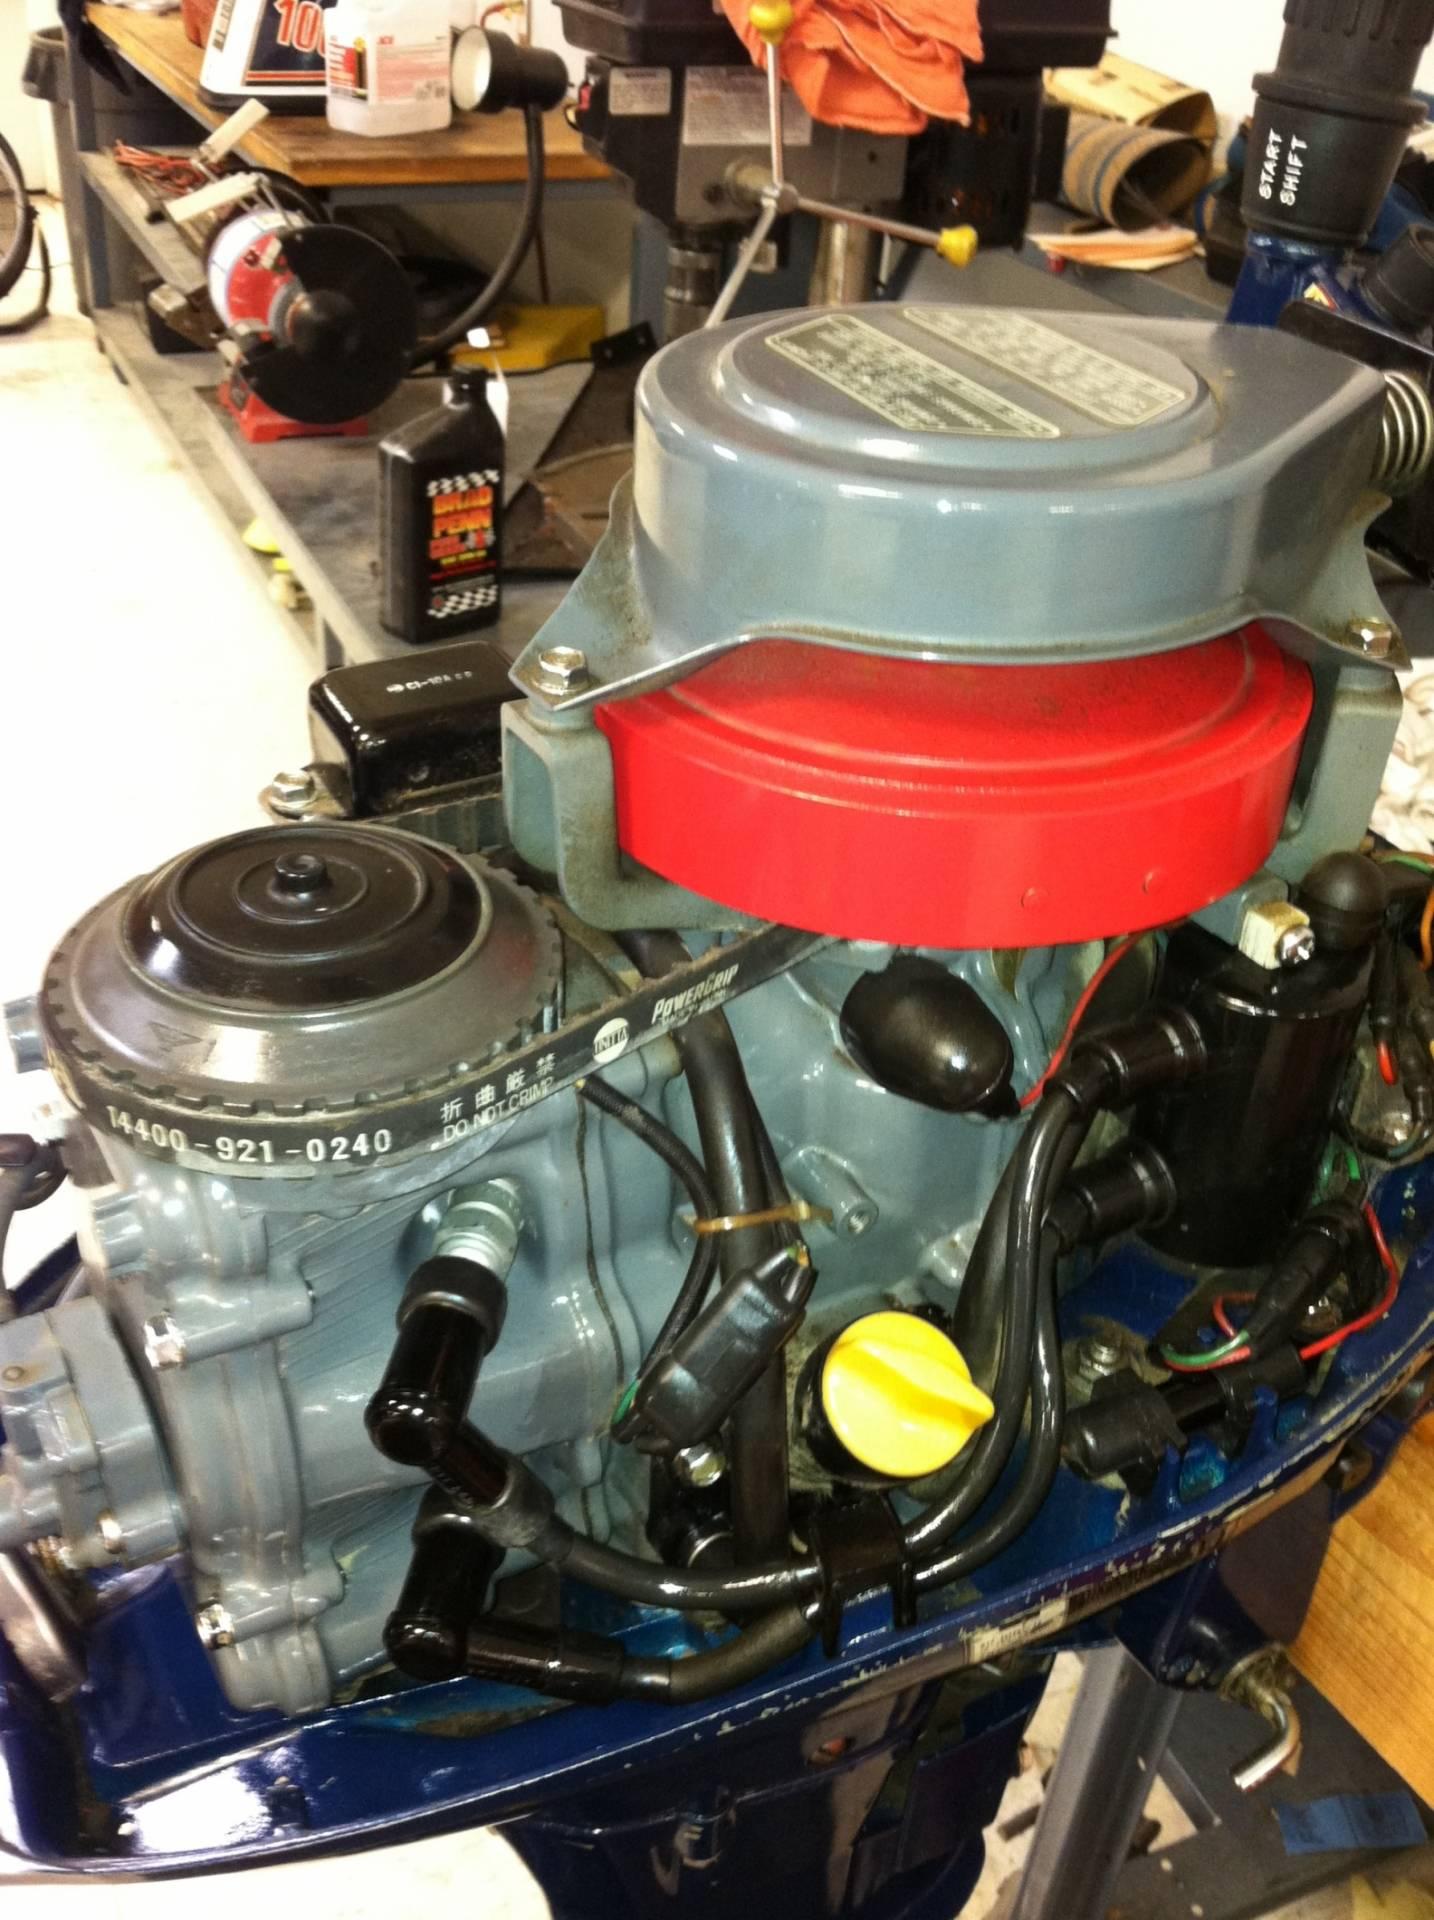 4 stroke honda 10 hp b100s outboard motor saltwater for Honda 2 5 hp outboard motor